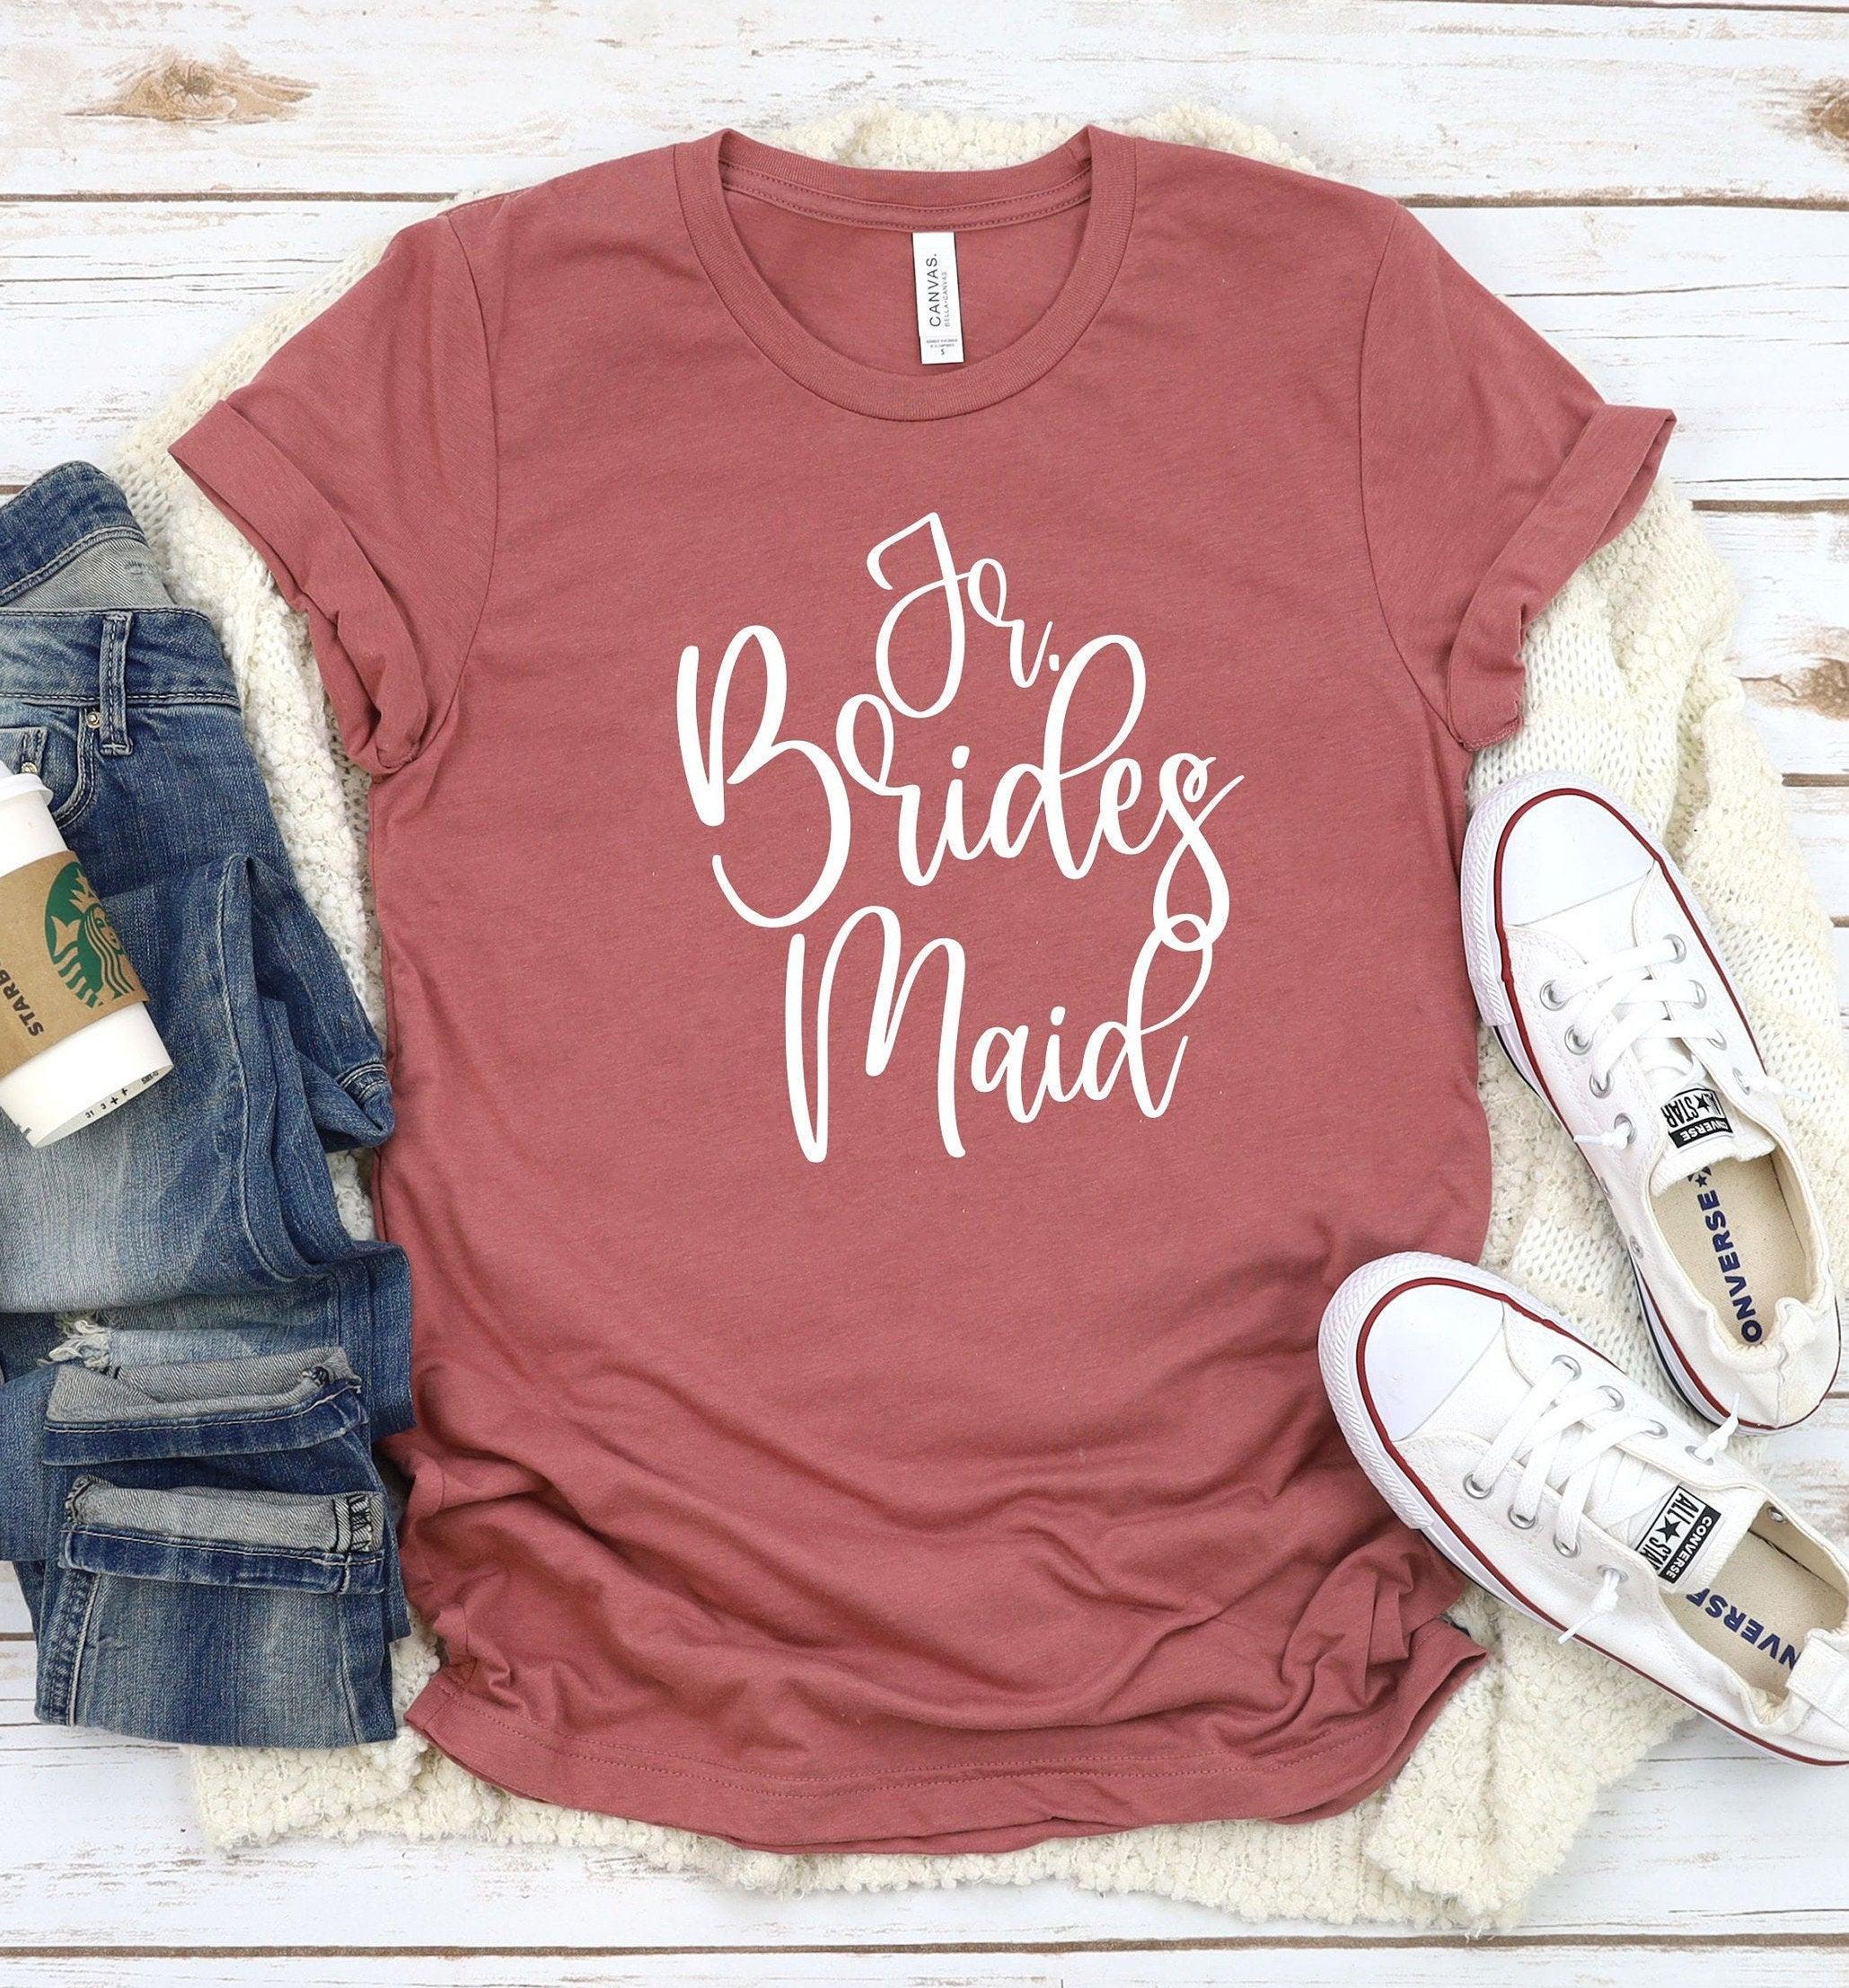 Jr-bridesmaid-svg-bridal-cut-file-bridesmaid-svg-bridal-party-svg-bachelorette-svg-bridal-svg-designs-wedding-cut-file-svg-for-cricut-60514d52